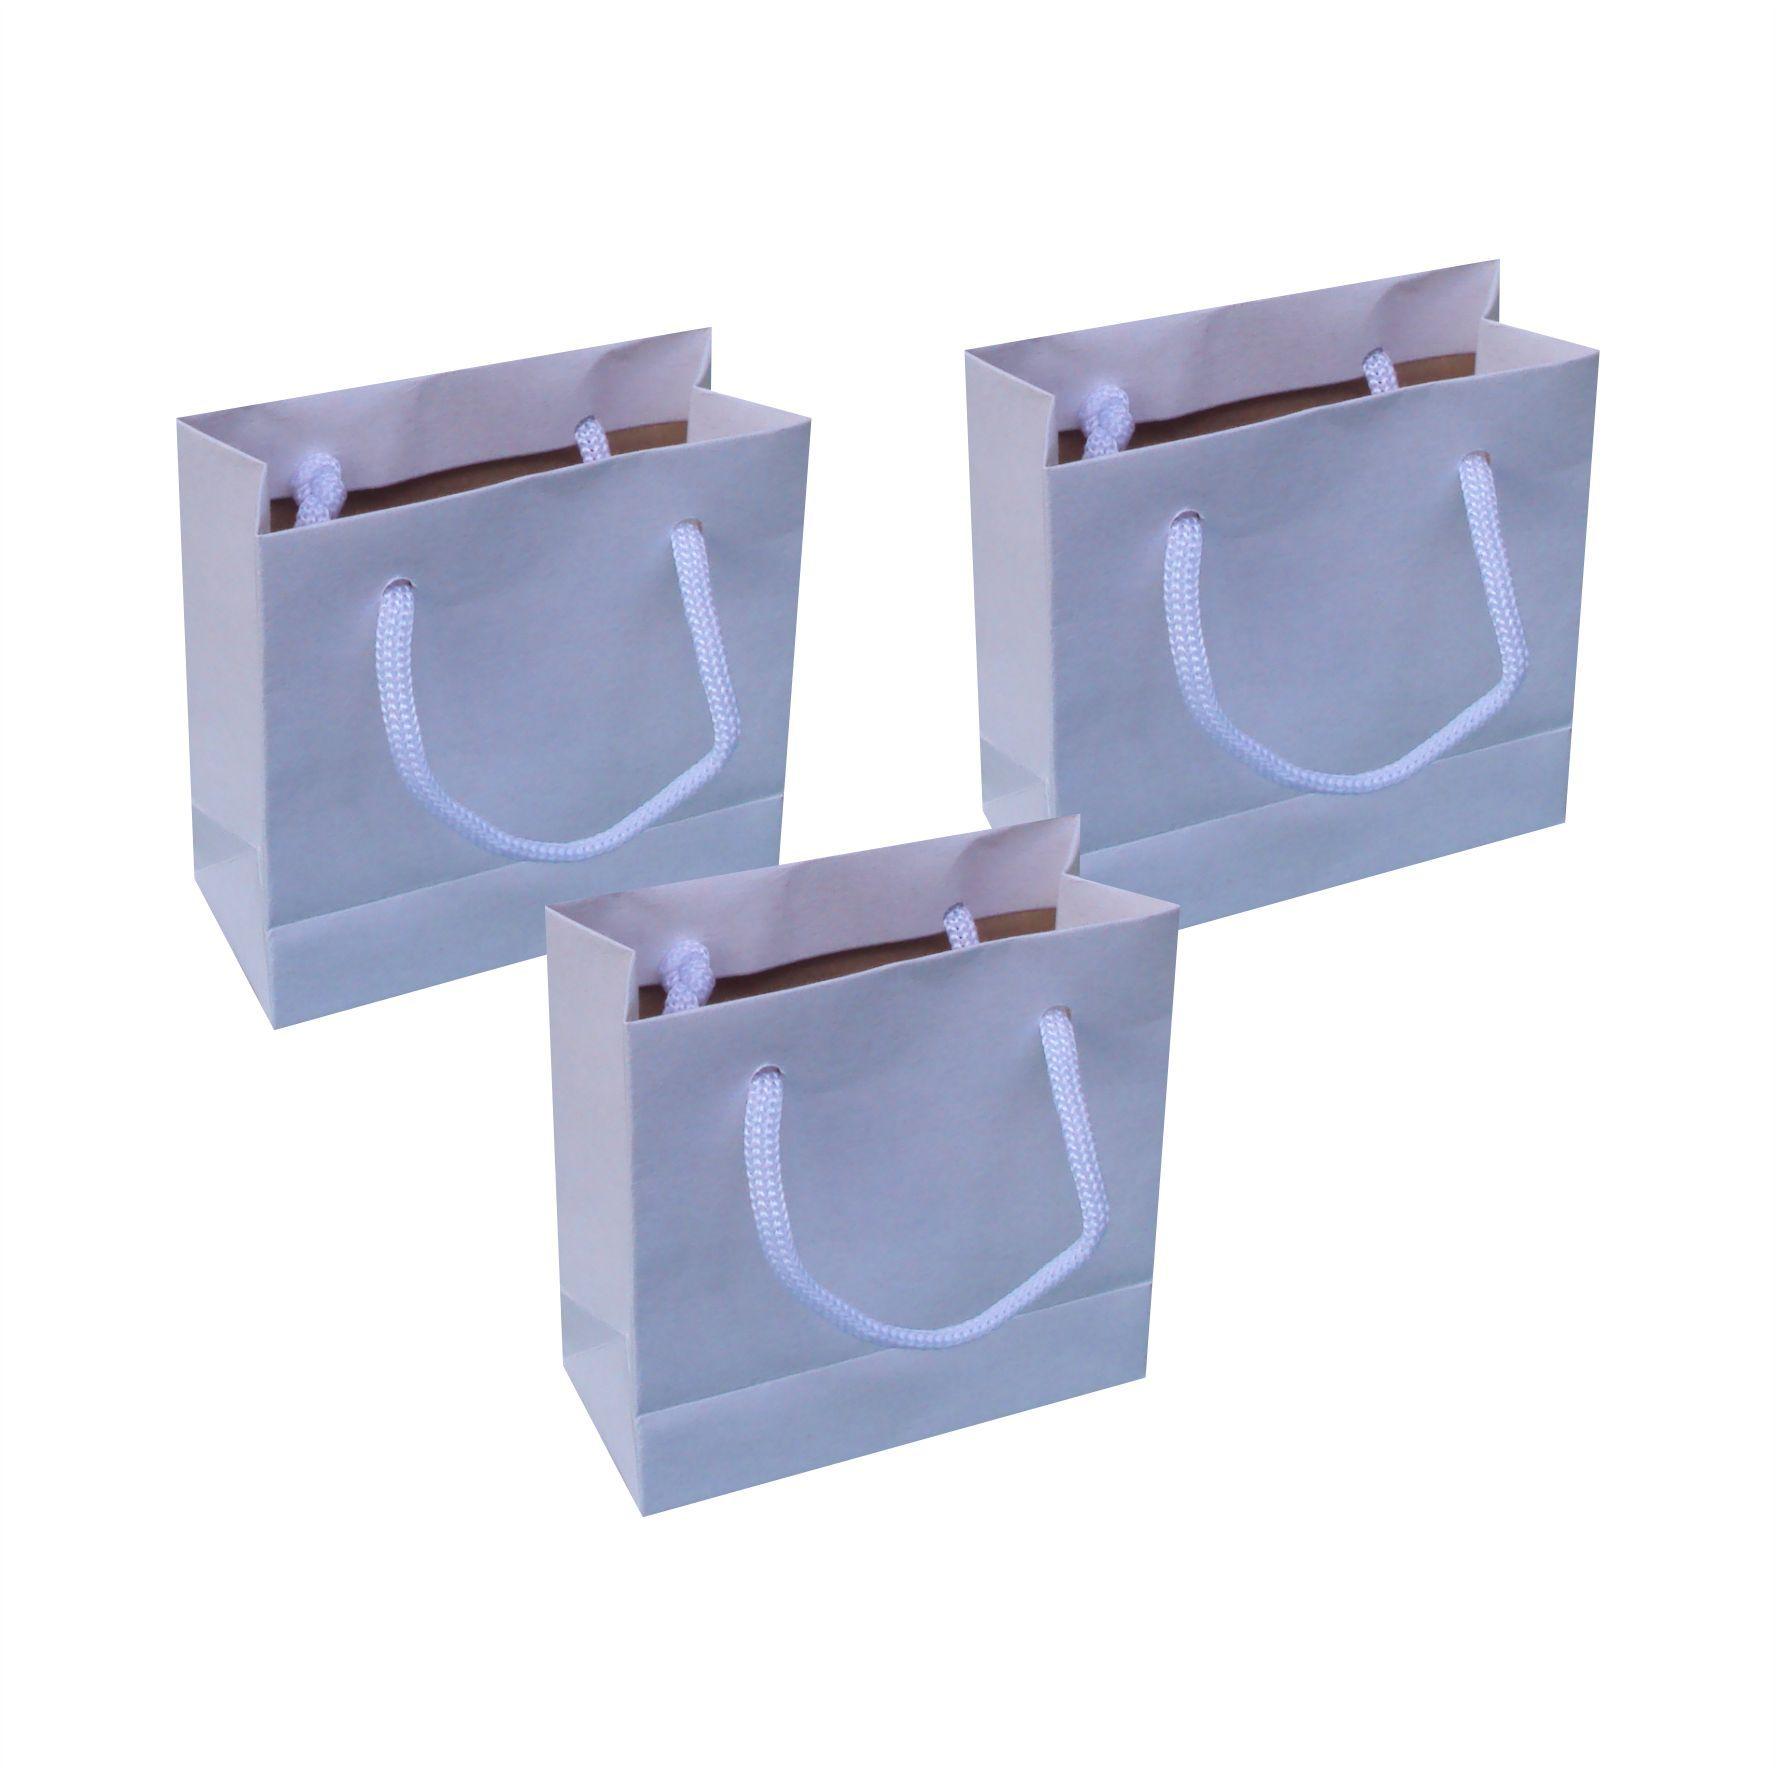 Sacola de papel kraft mini - cor branca tamanho  -10x10x4,5 cm - 10 unidades